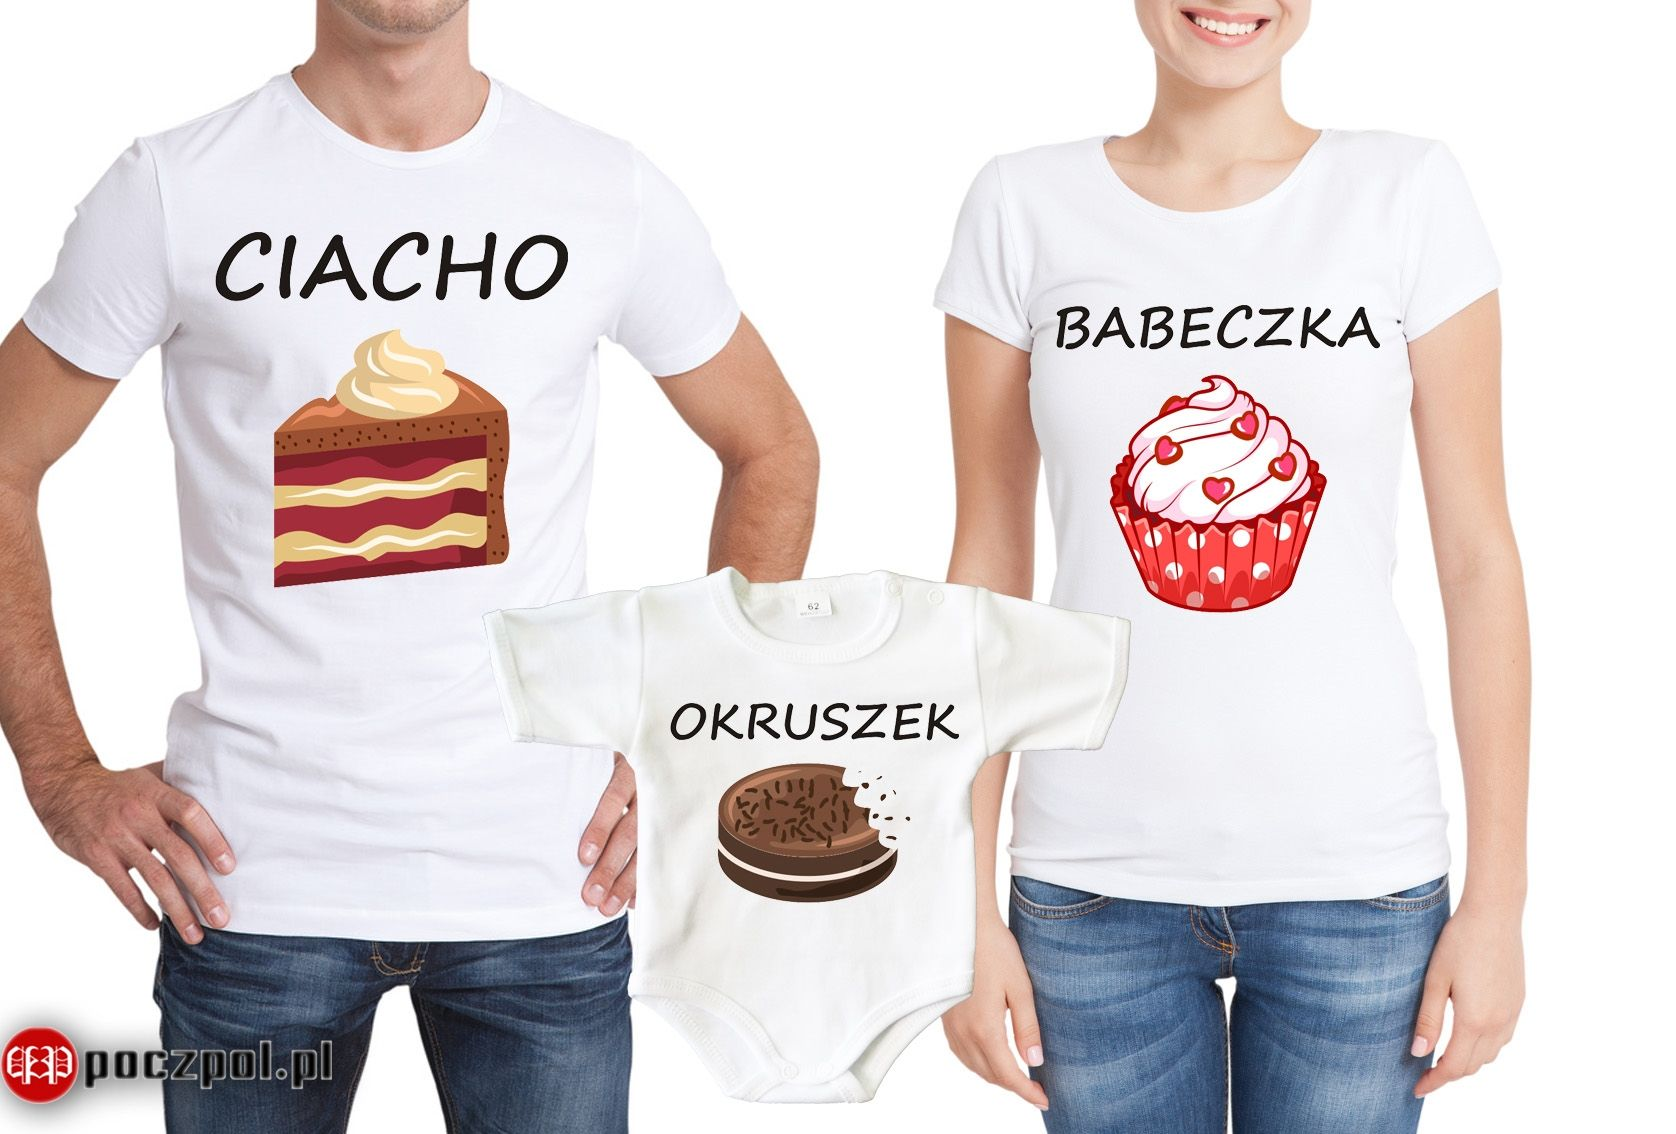 Http Namalu Pl Dla Par 86 Ksiezyc Jego Zycia Koszulka Damska